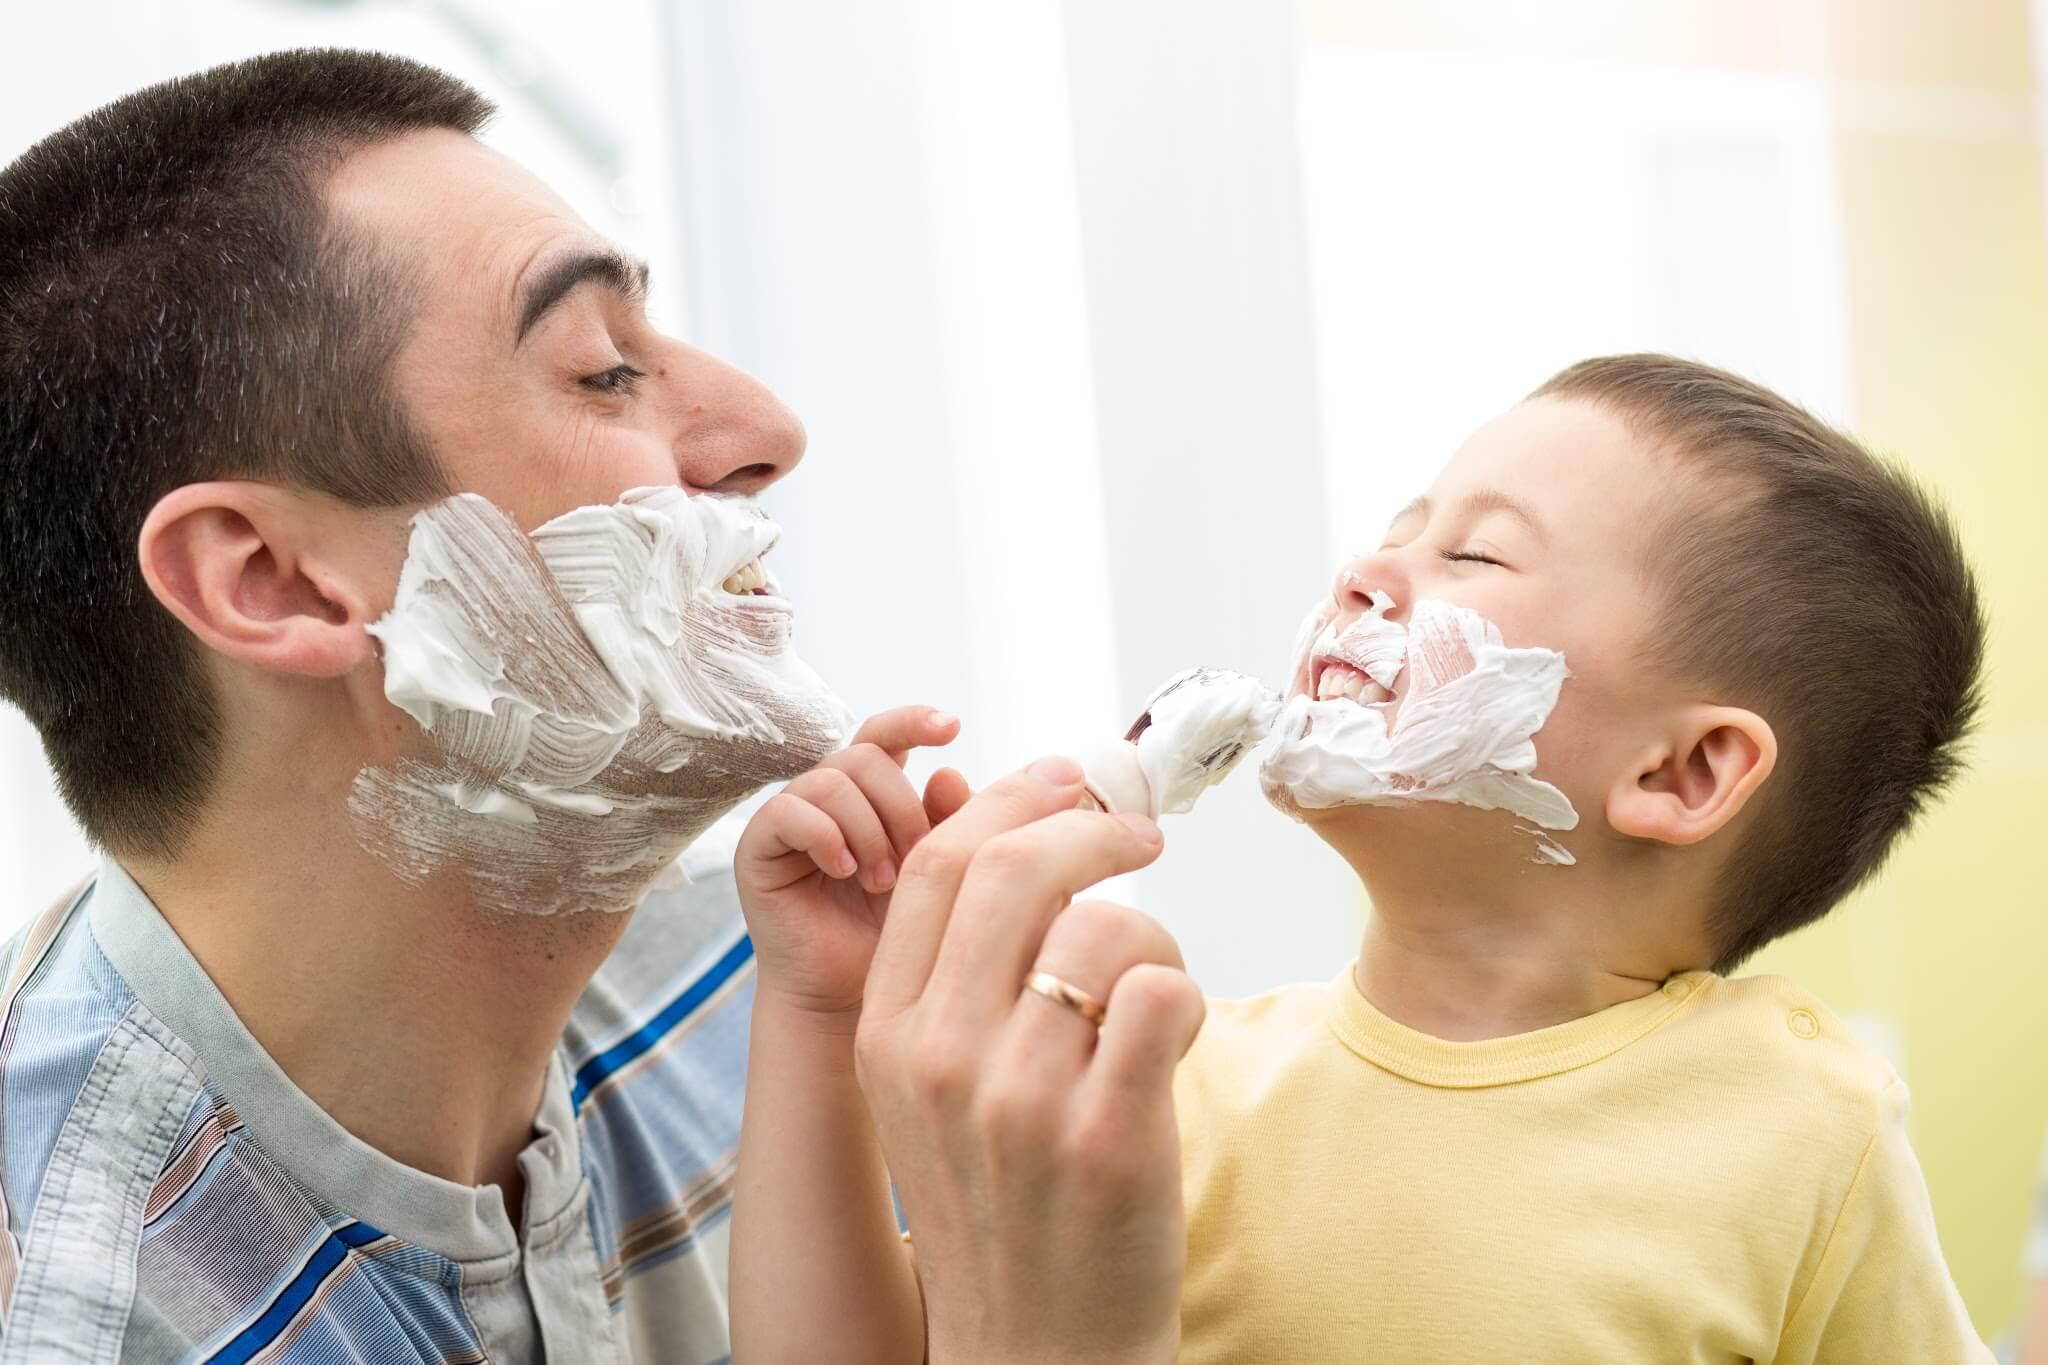 Safe and efficient shaving